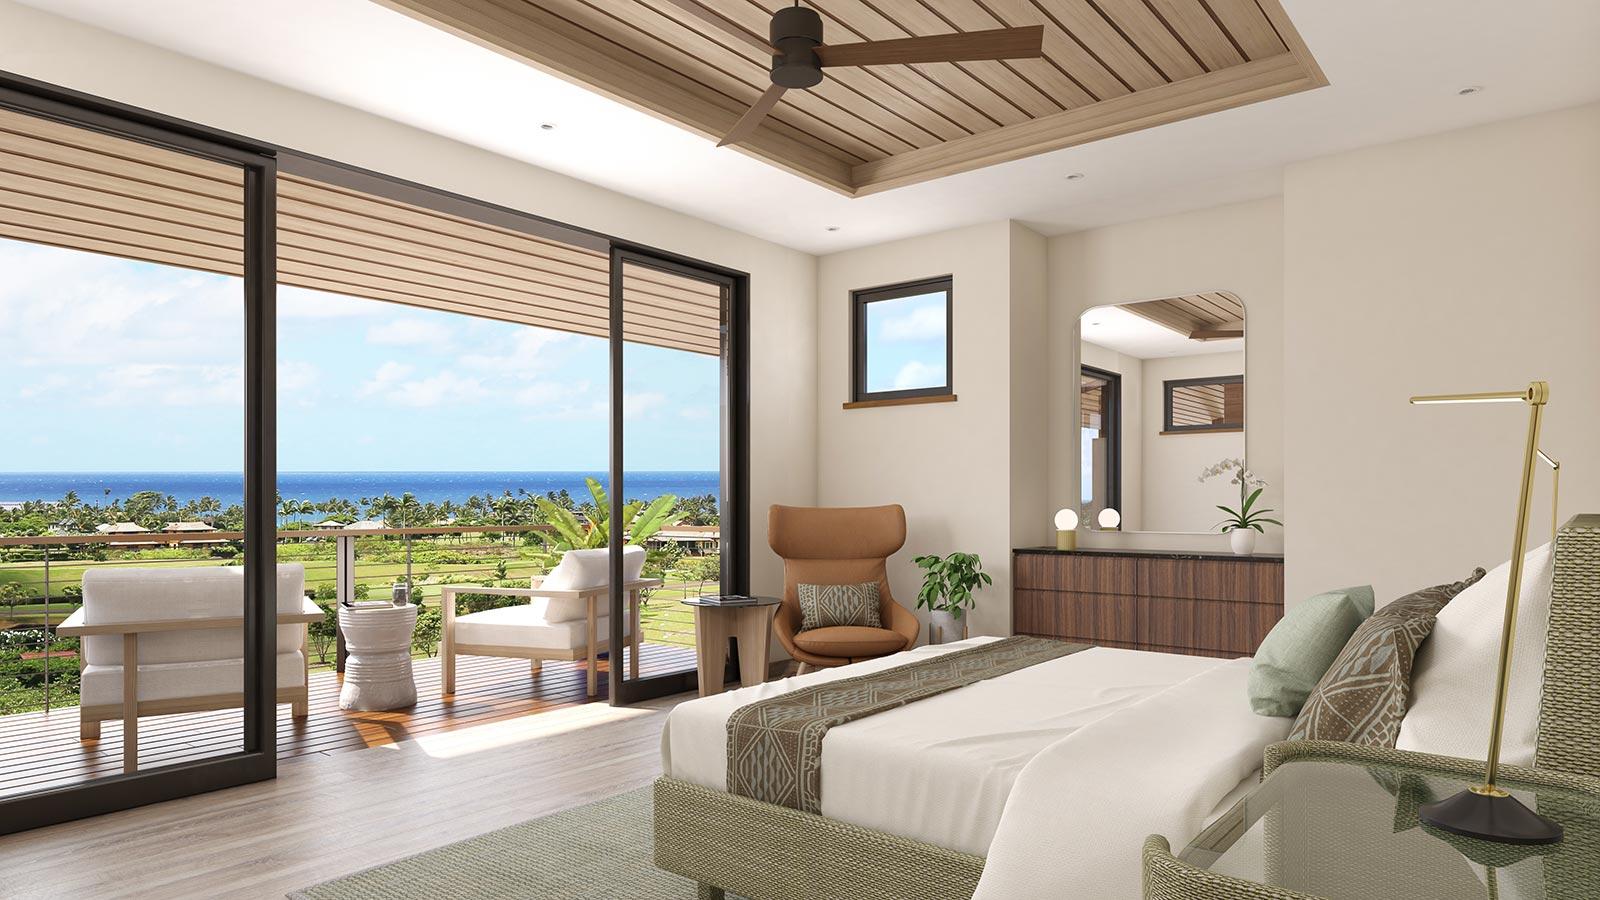 Kukuiula-Kauai-Hawaii-3D-rendering-bedroom